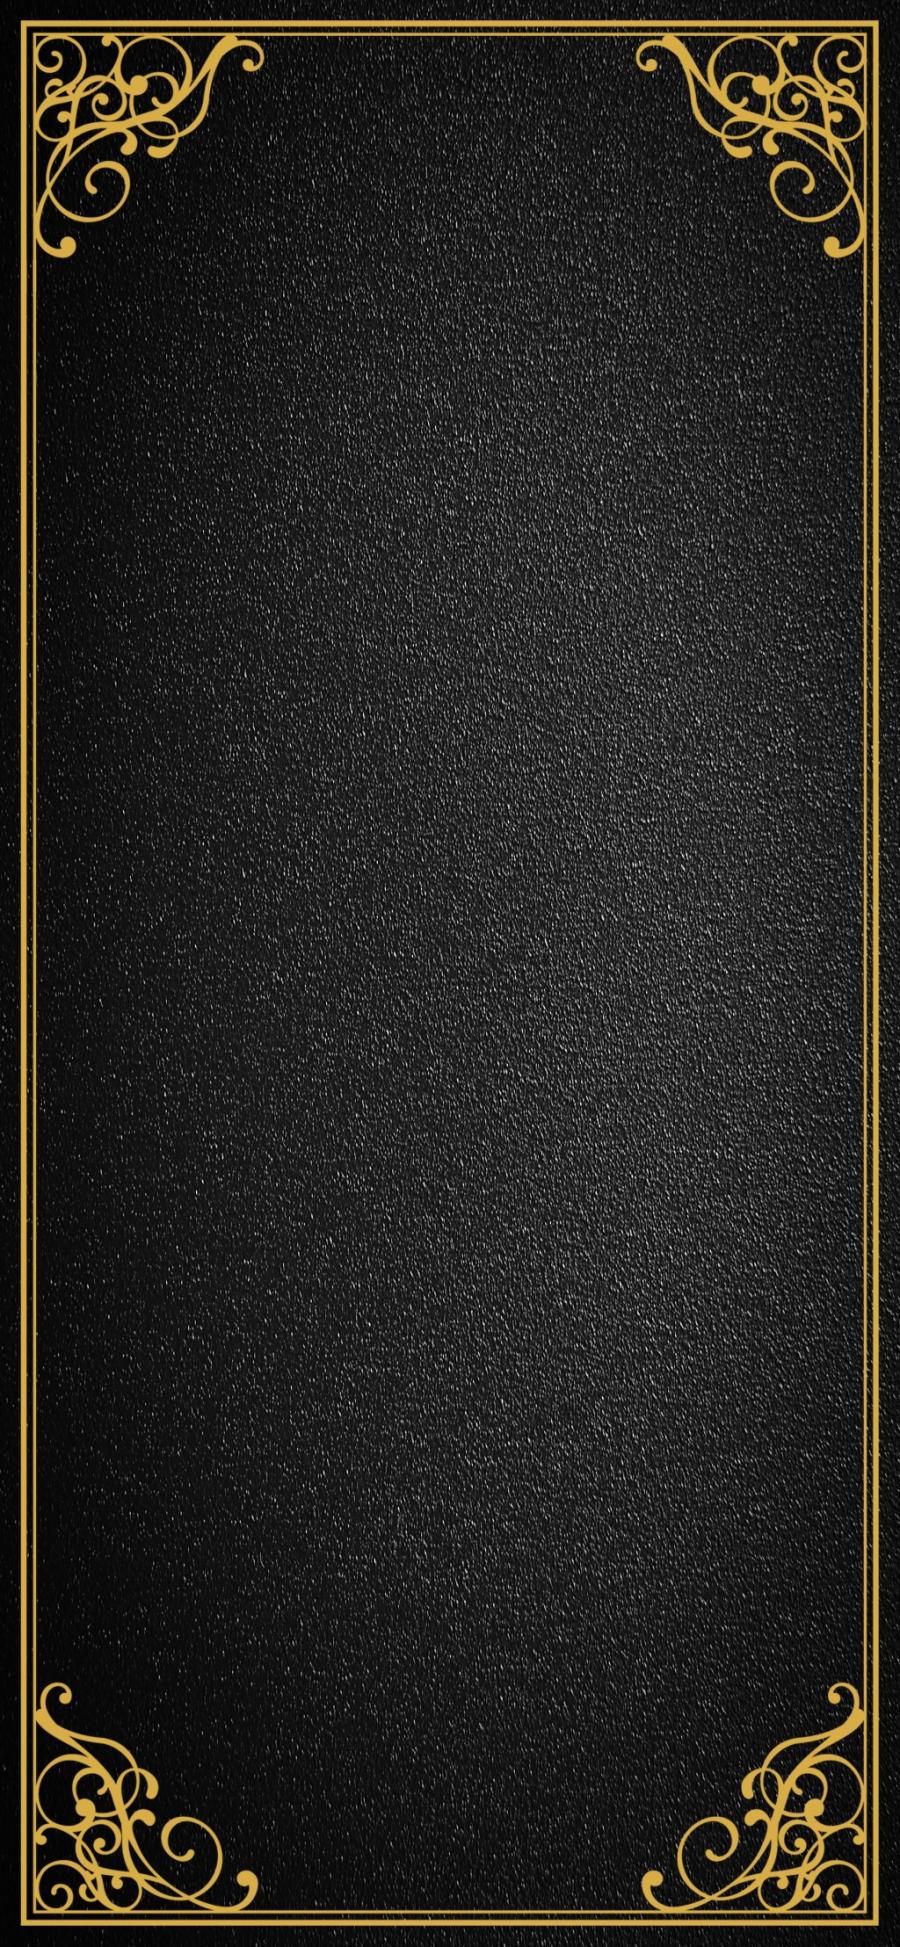 Birthday Invitation Black Gold Style Simple Fashion Background 900x1947